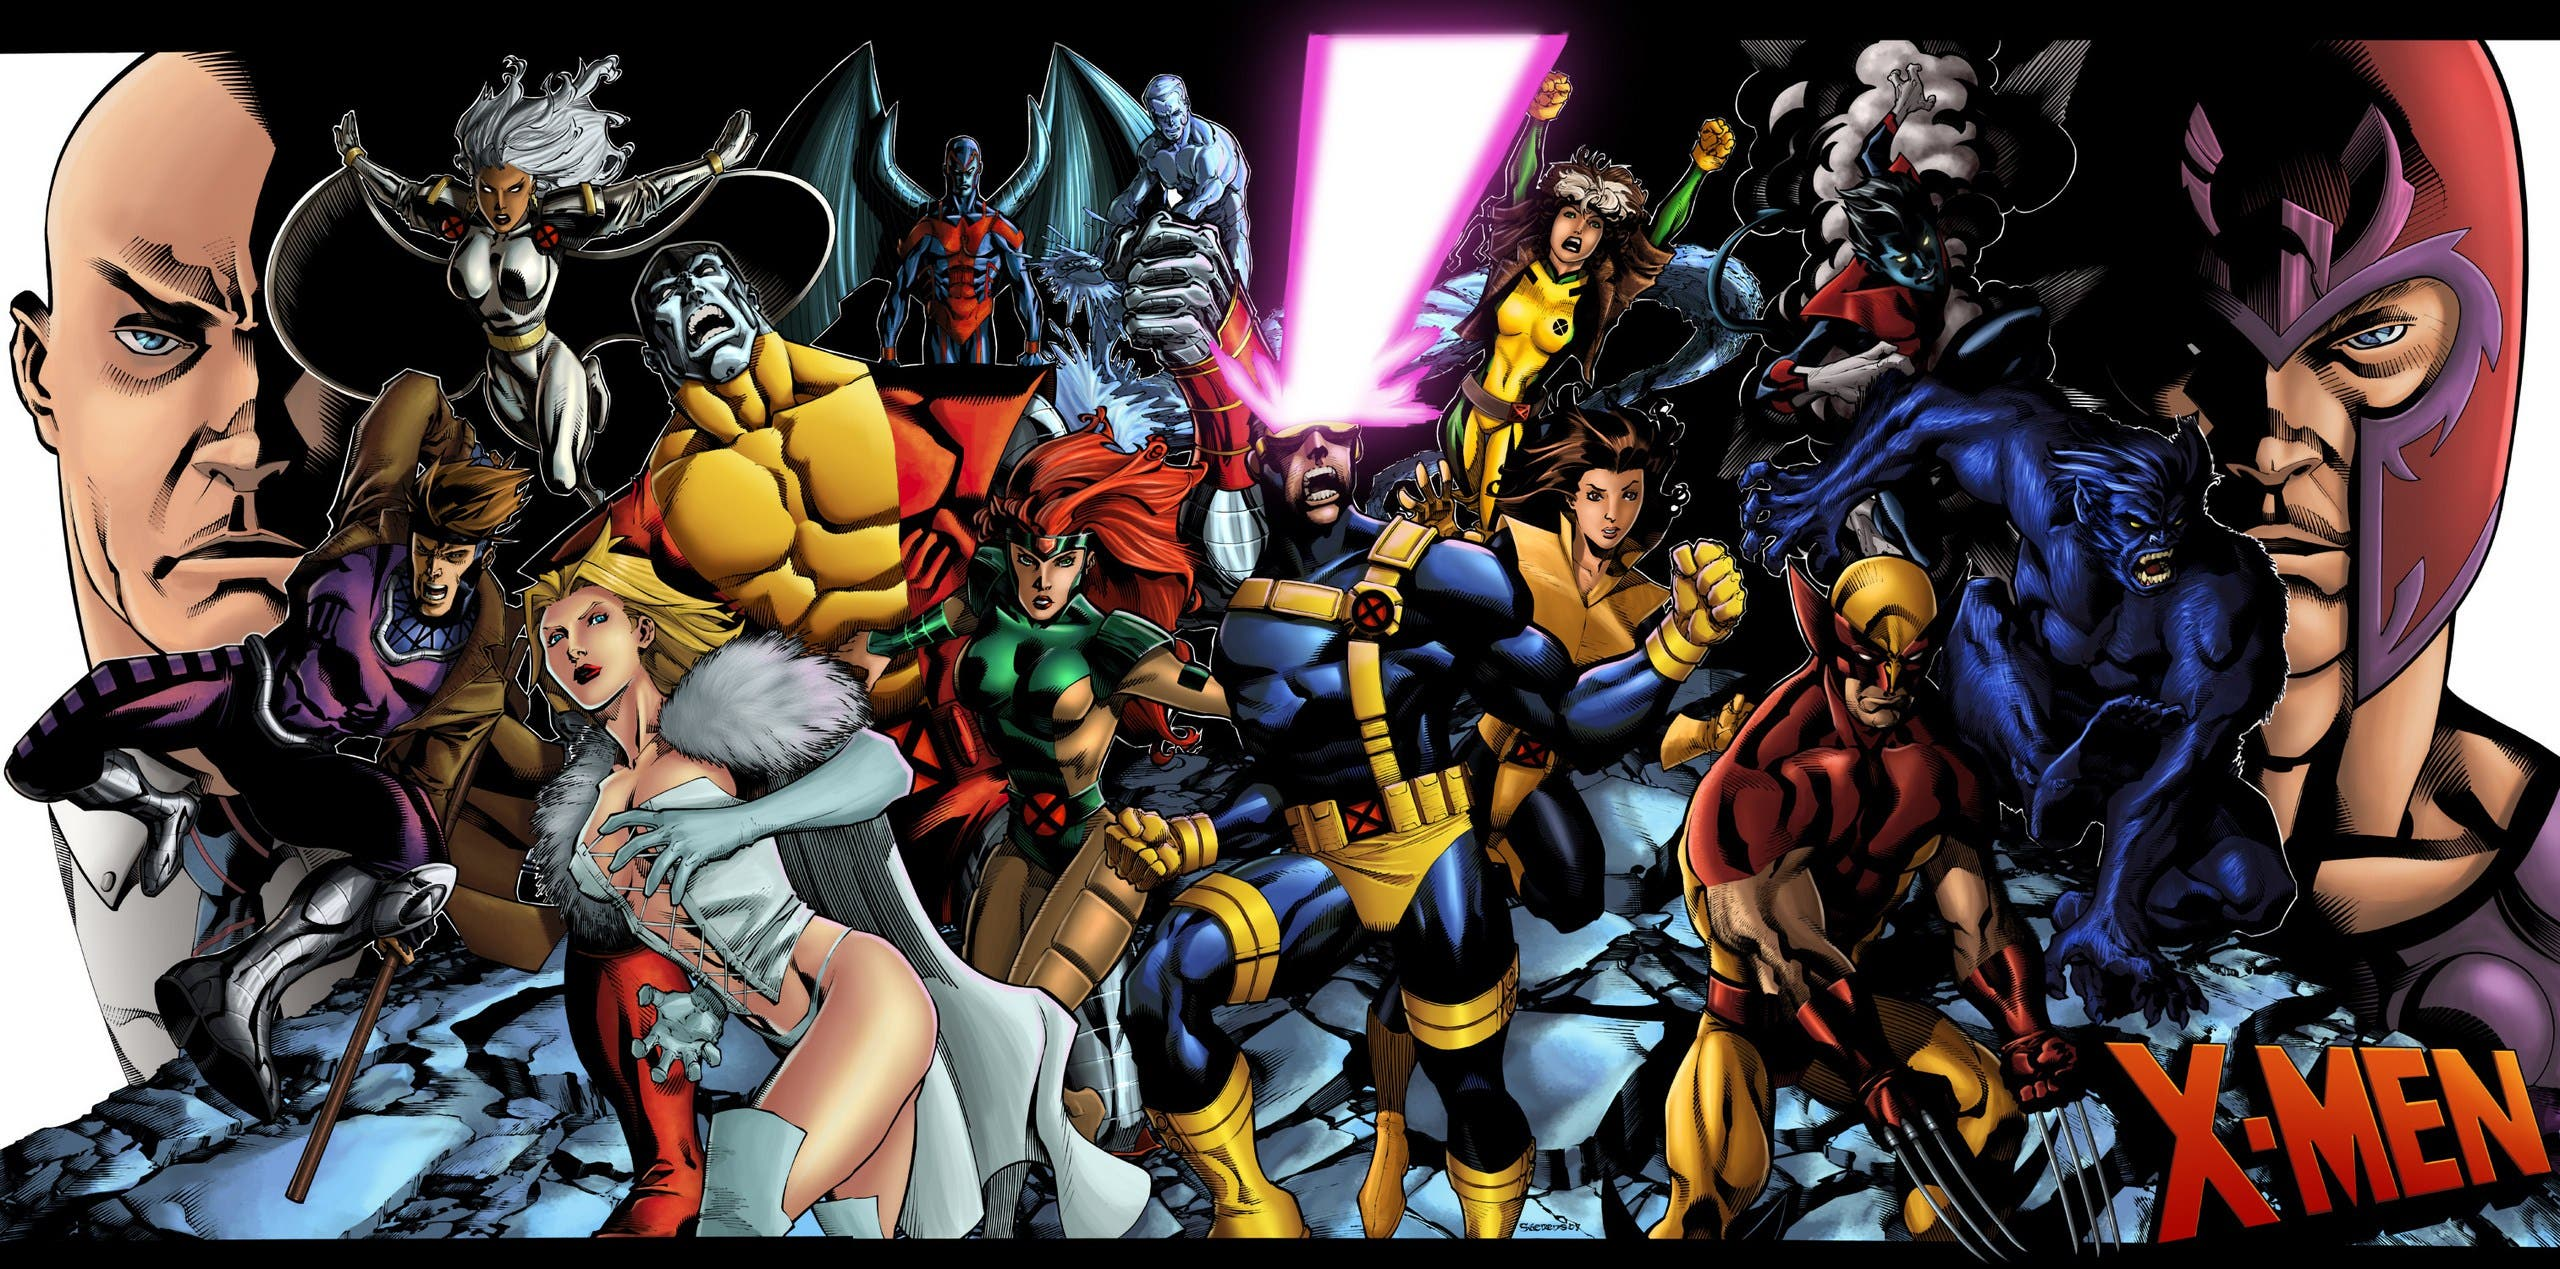 X-men-x-men-23208439-2560-1269